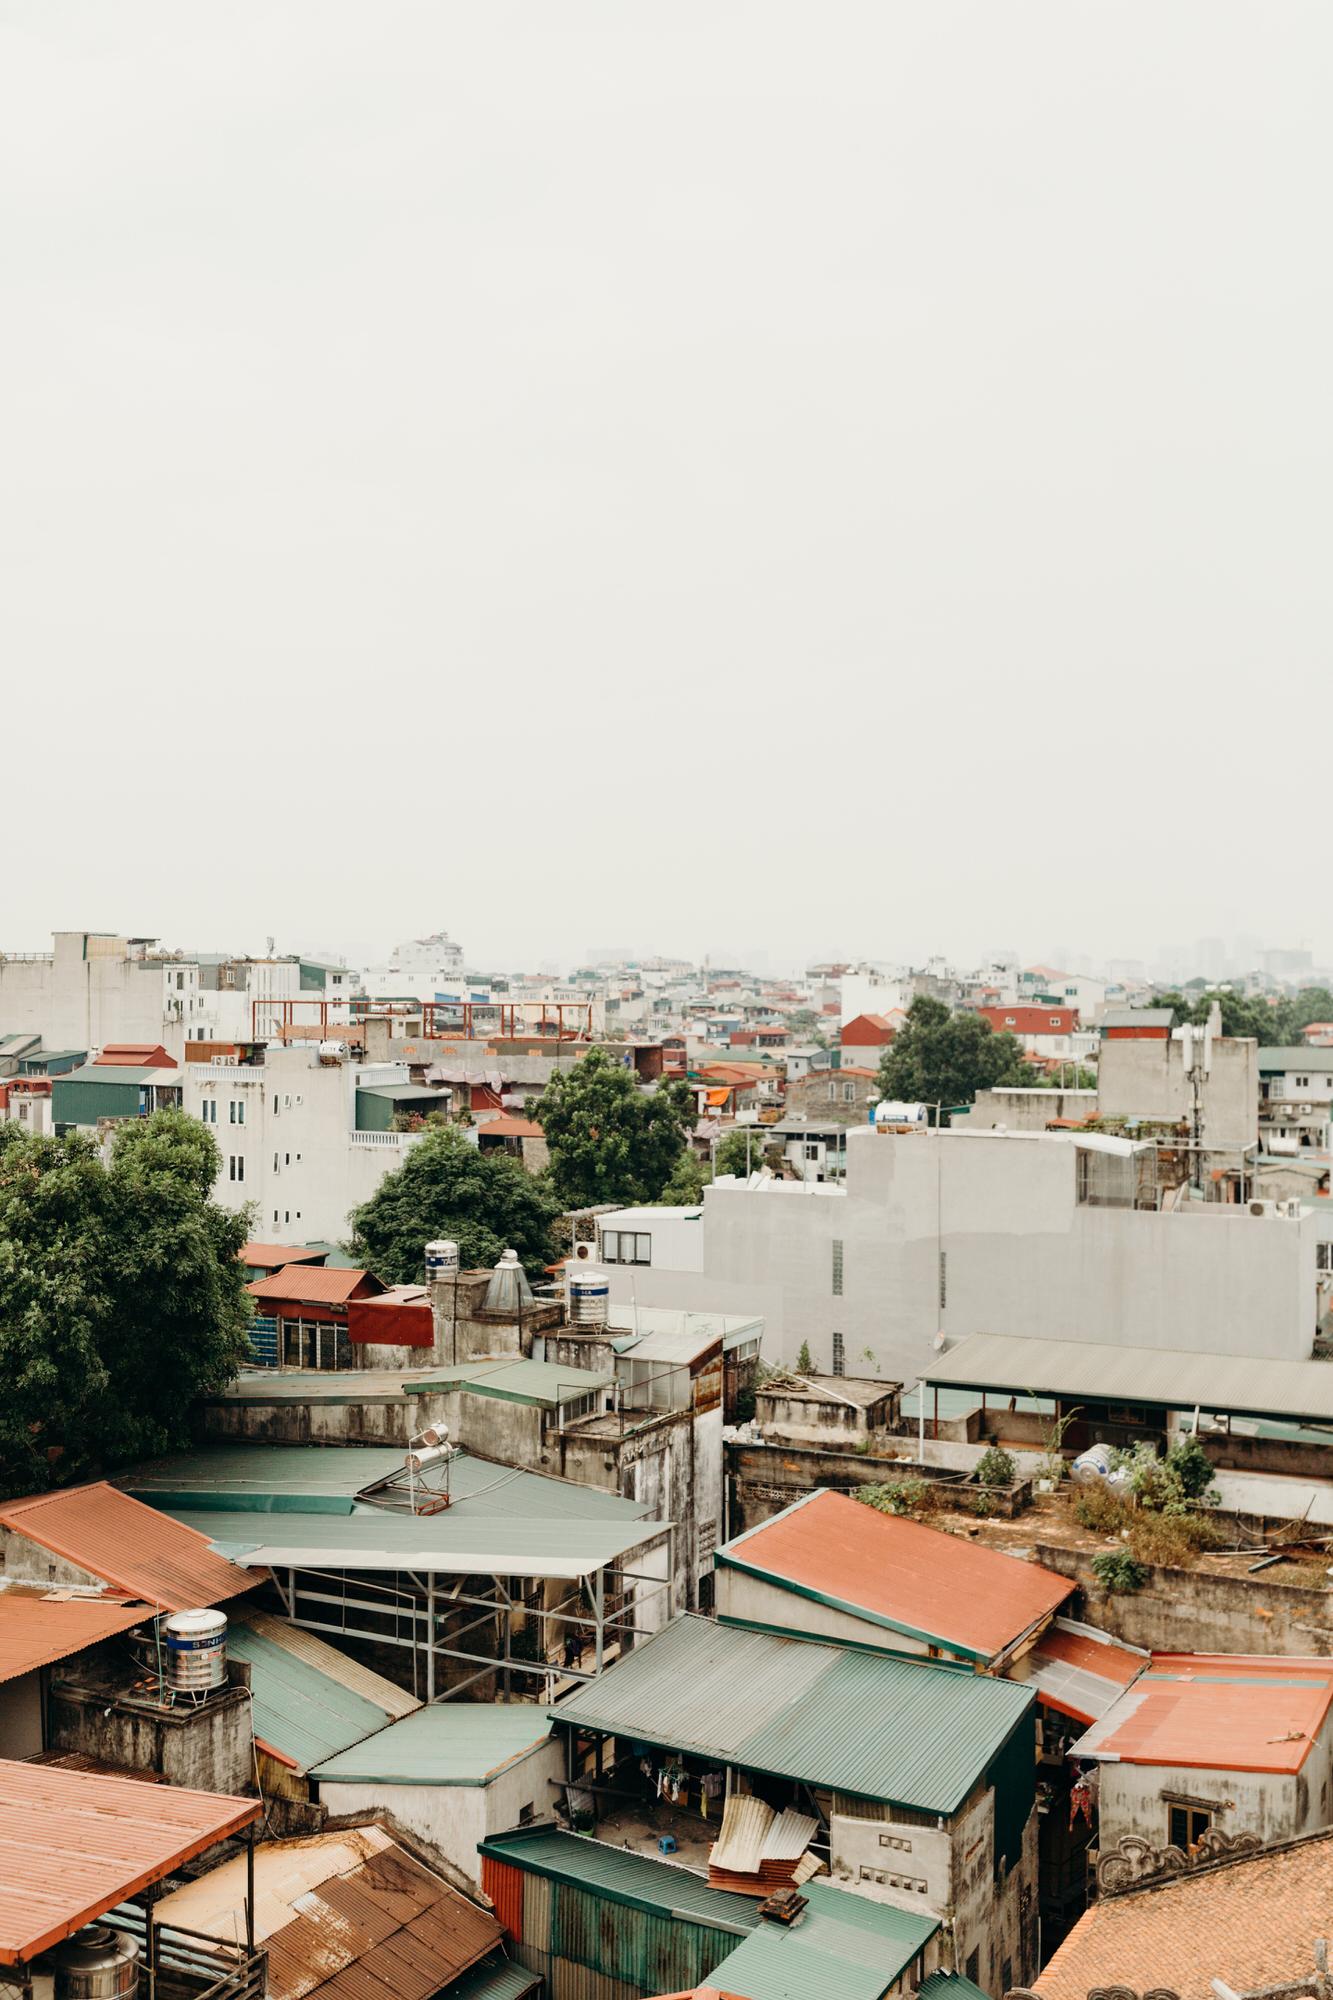 hanoivietnamtravelblog-9693-1.jpg